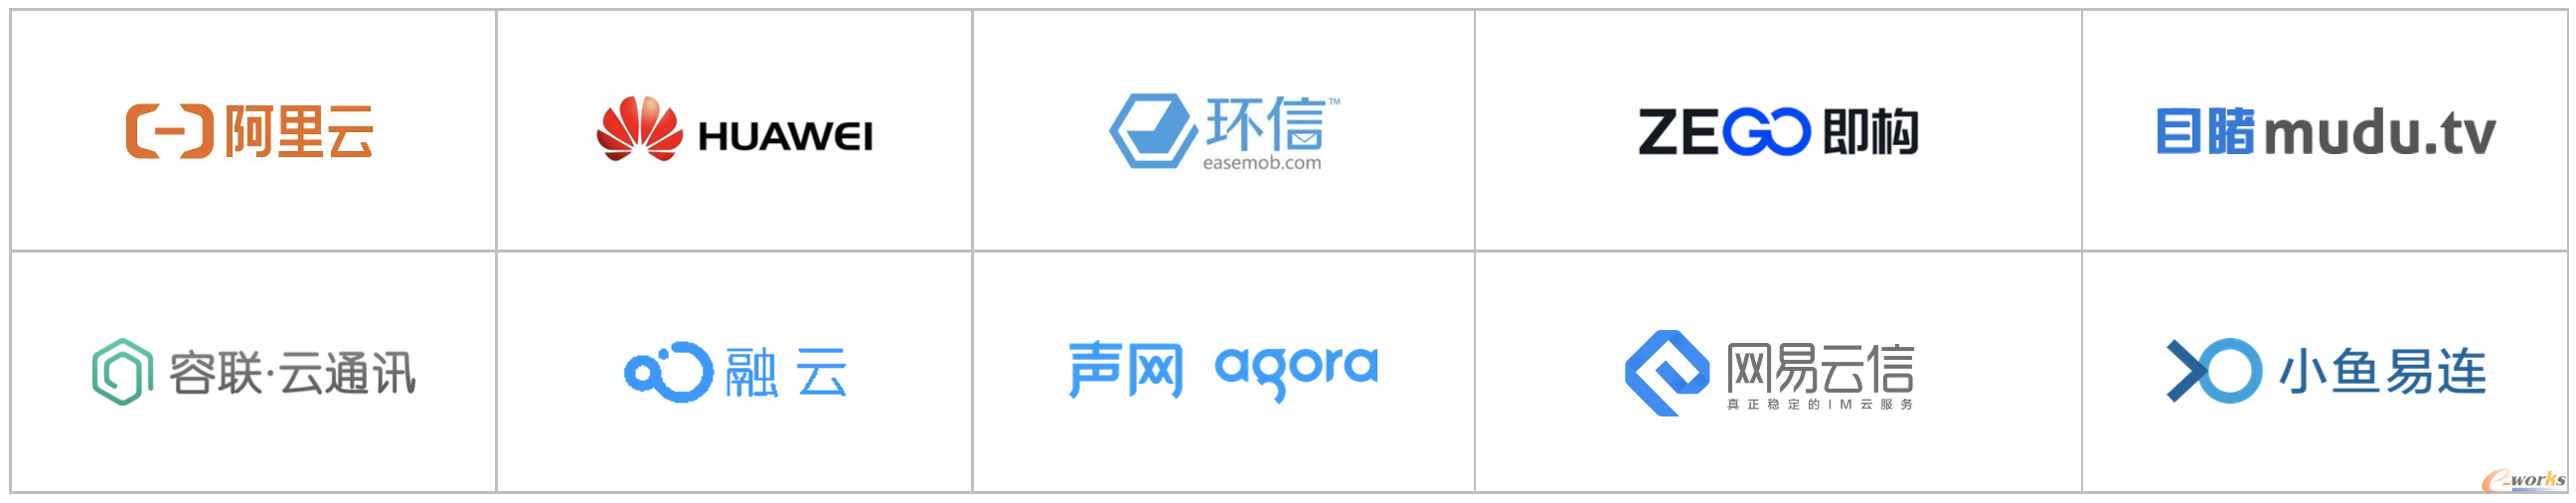 http://www.e-works.net.cn/News/articleimage/202012/132512894405950350_new.png